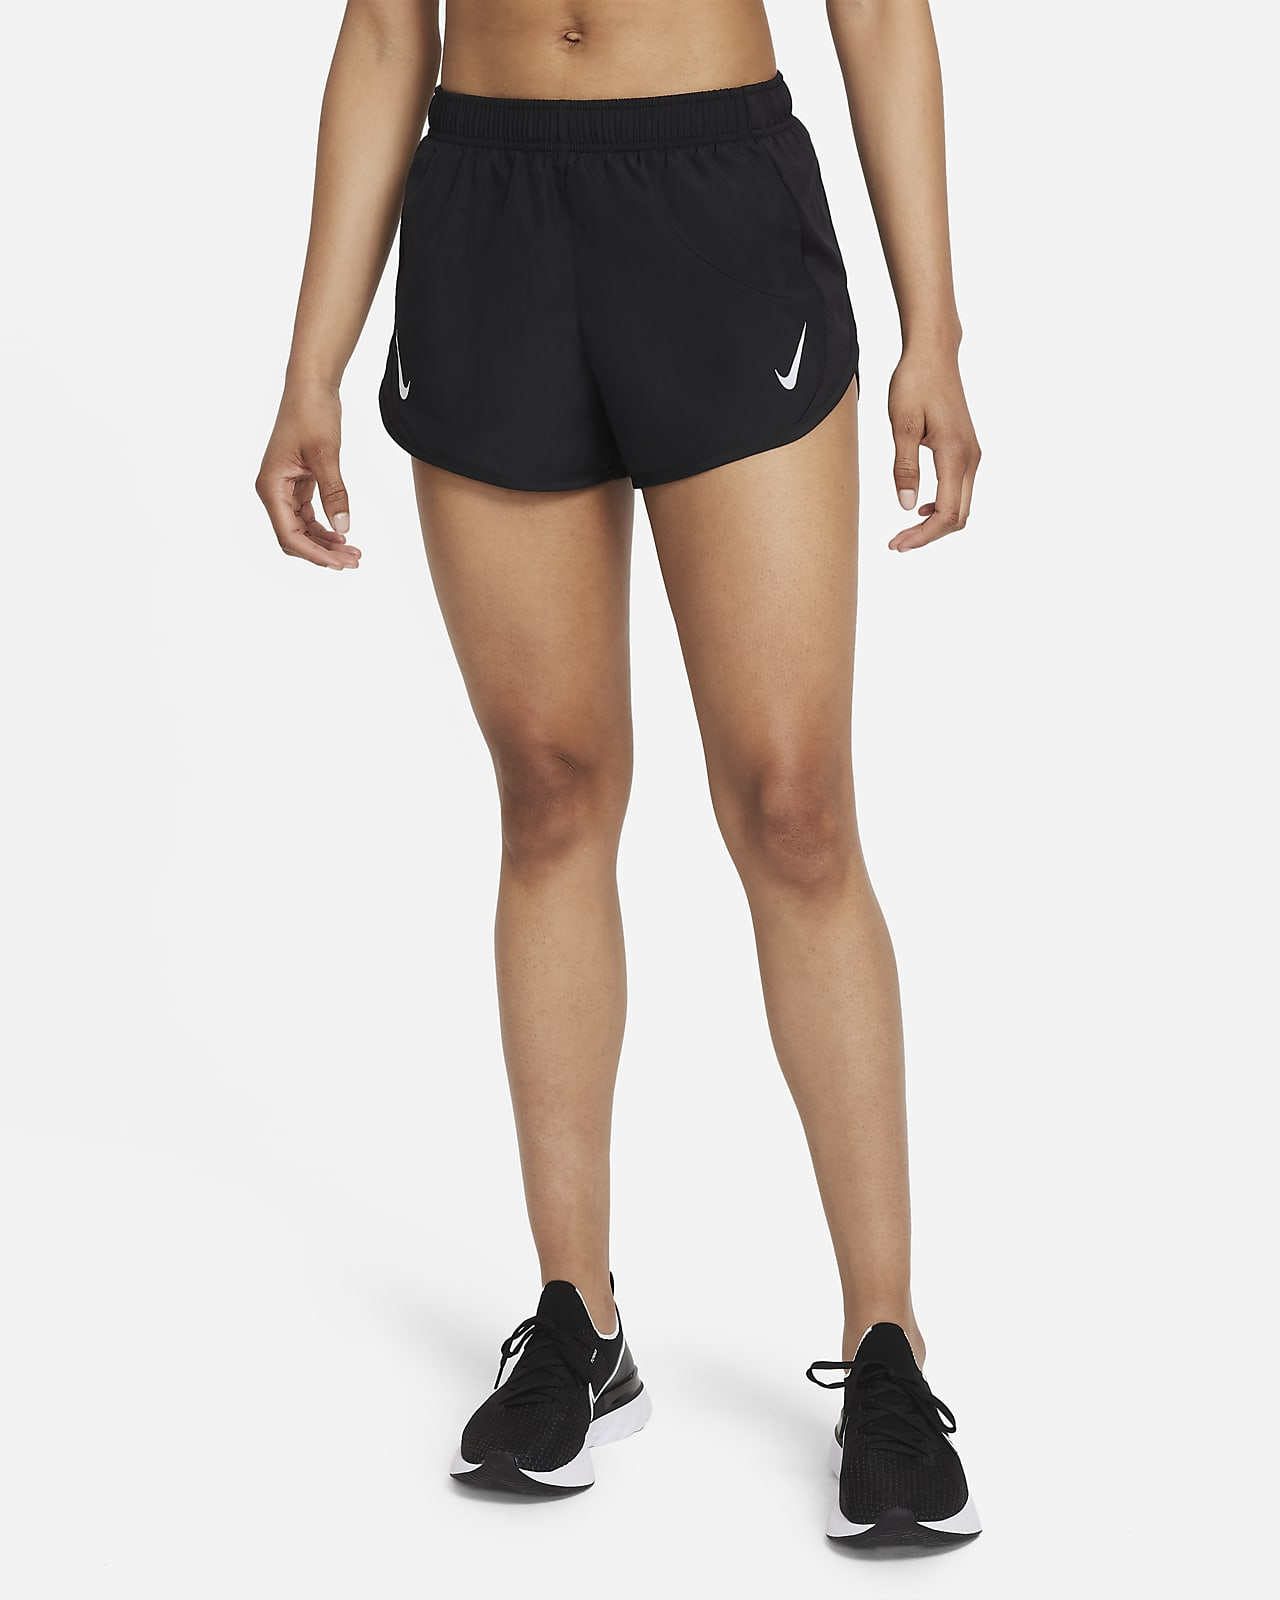 Shorts de running para mujer Nike Dri-FIT Tempo Race